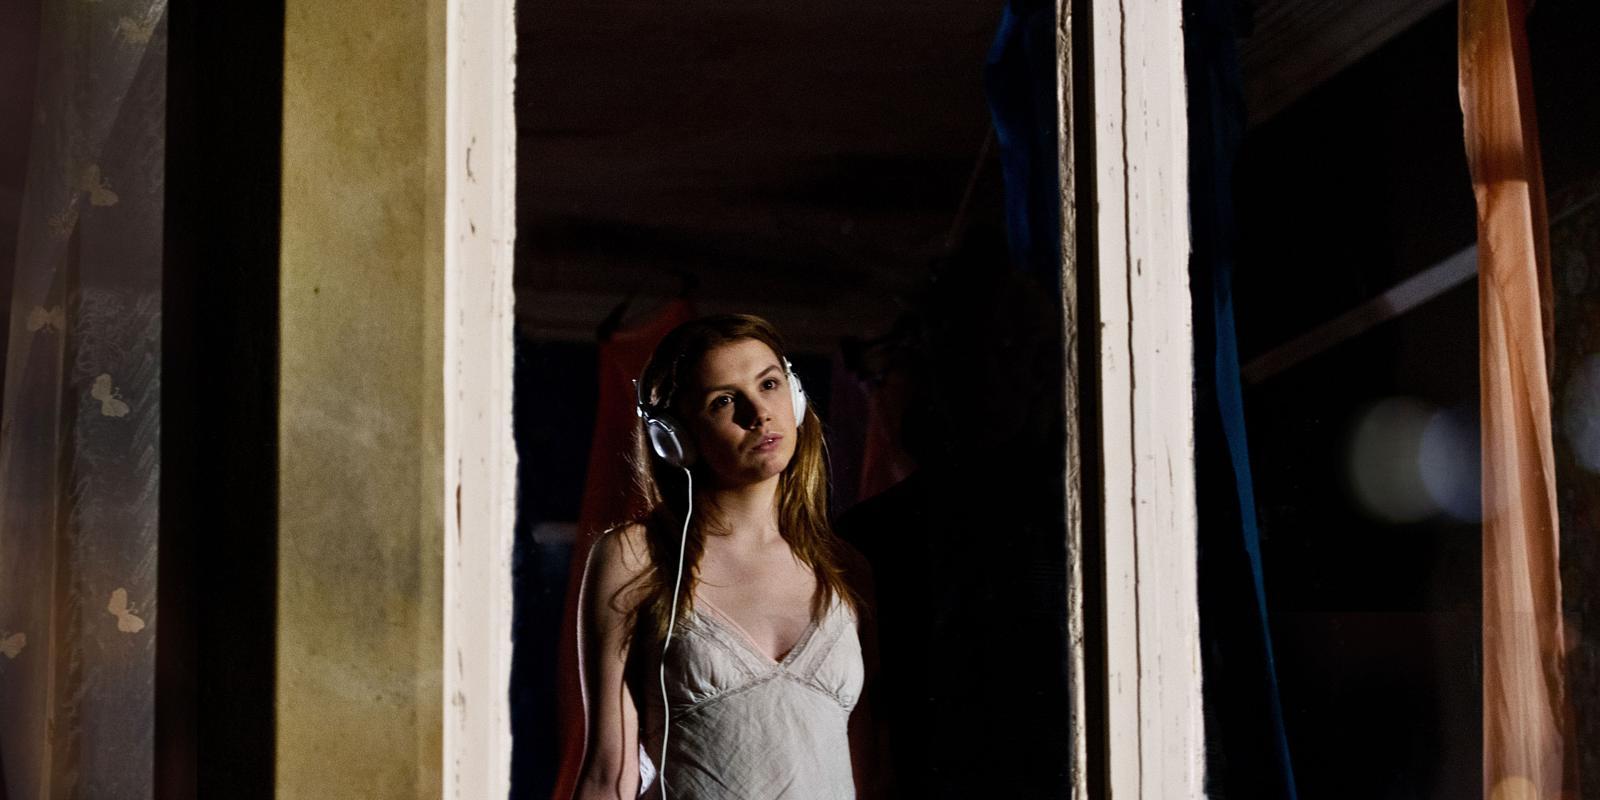 Skins season 1 episode cassie : Hum tumhare sanam movie song mp3